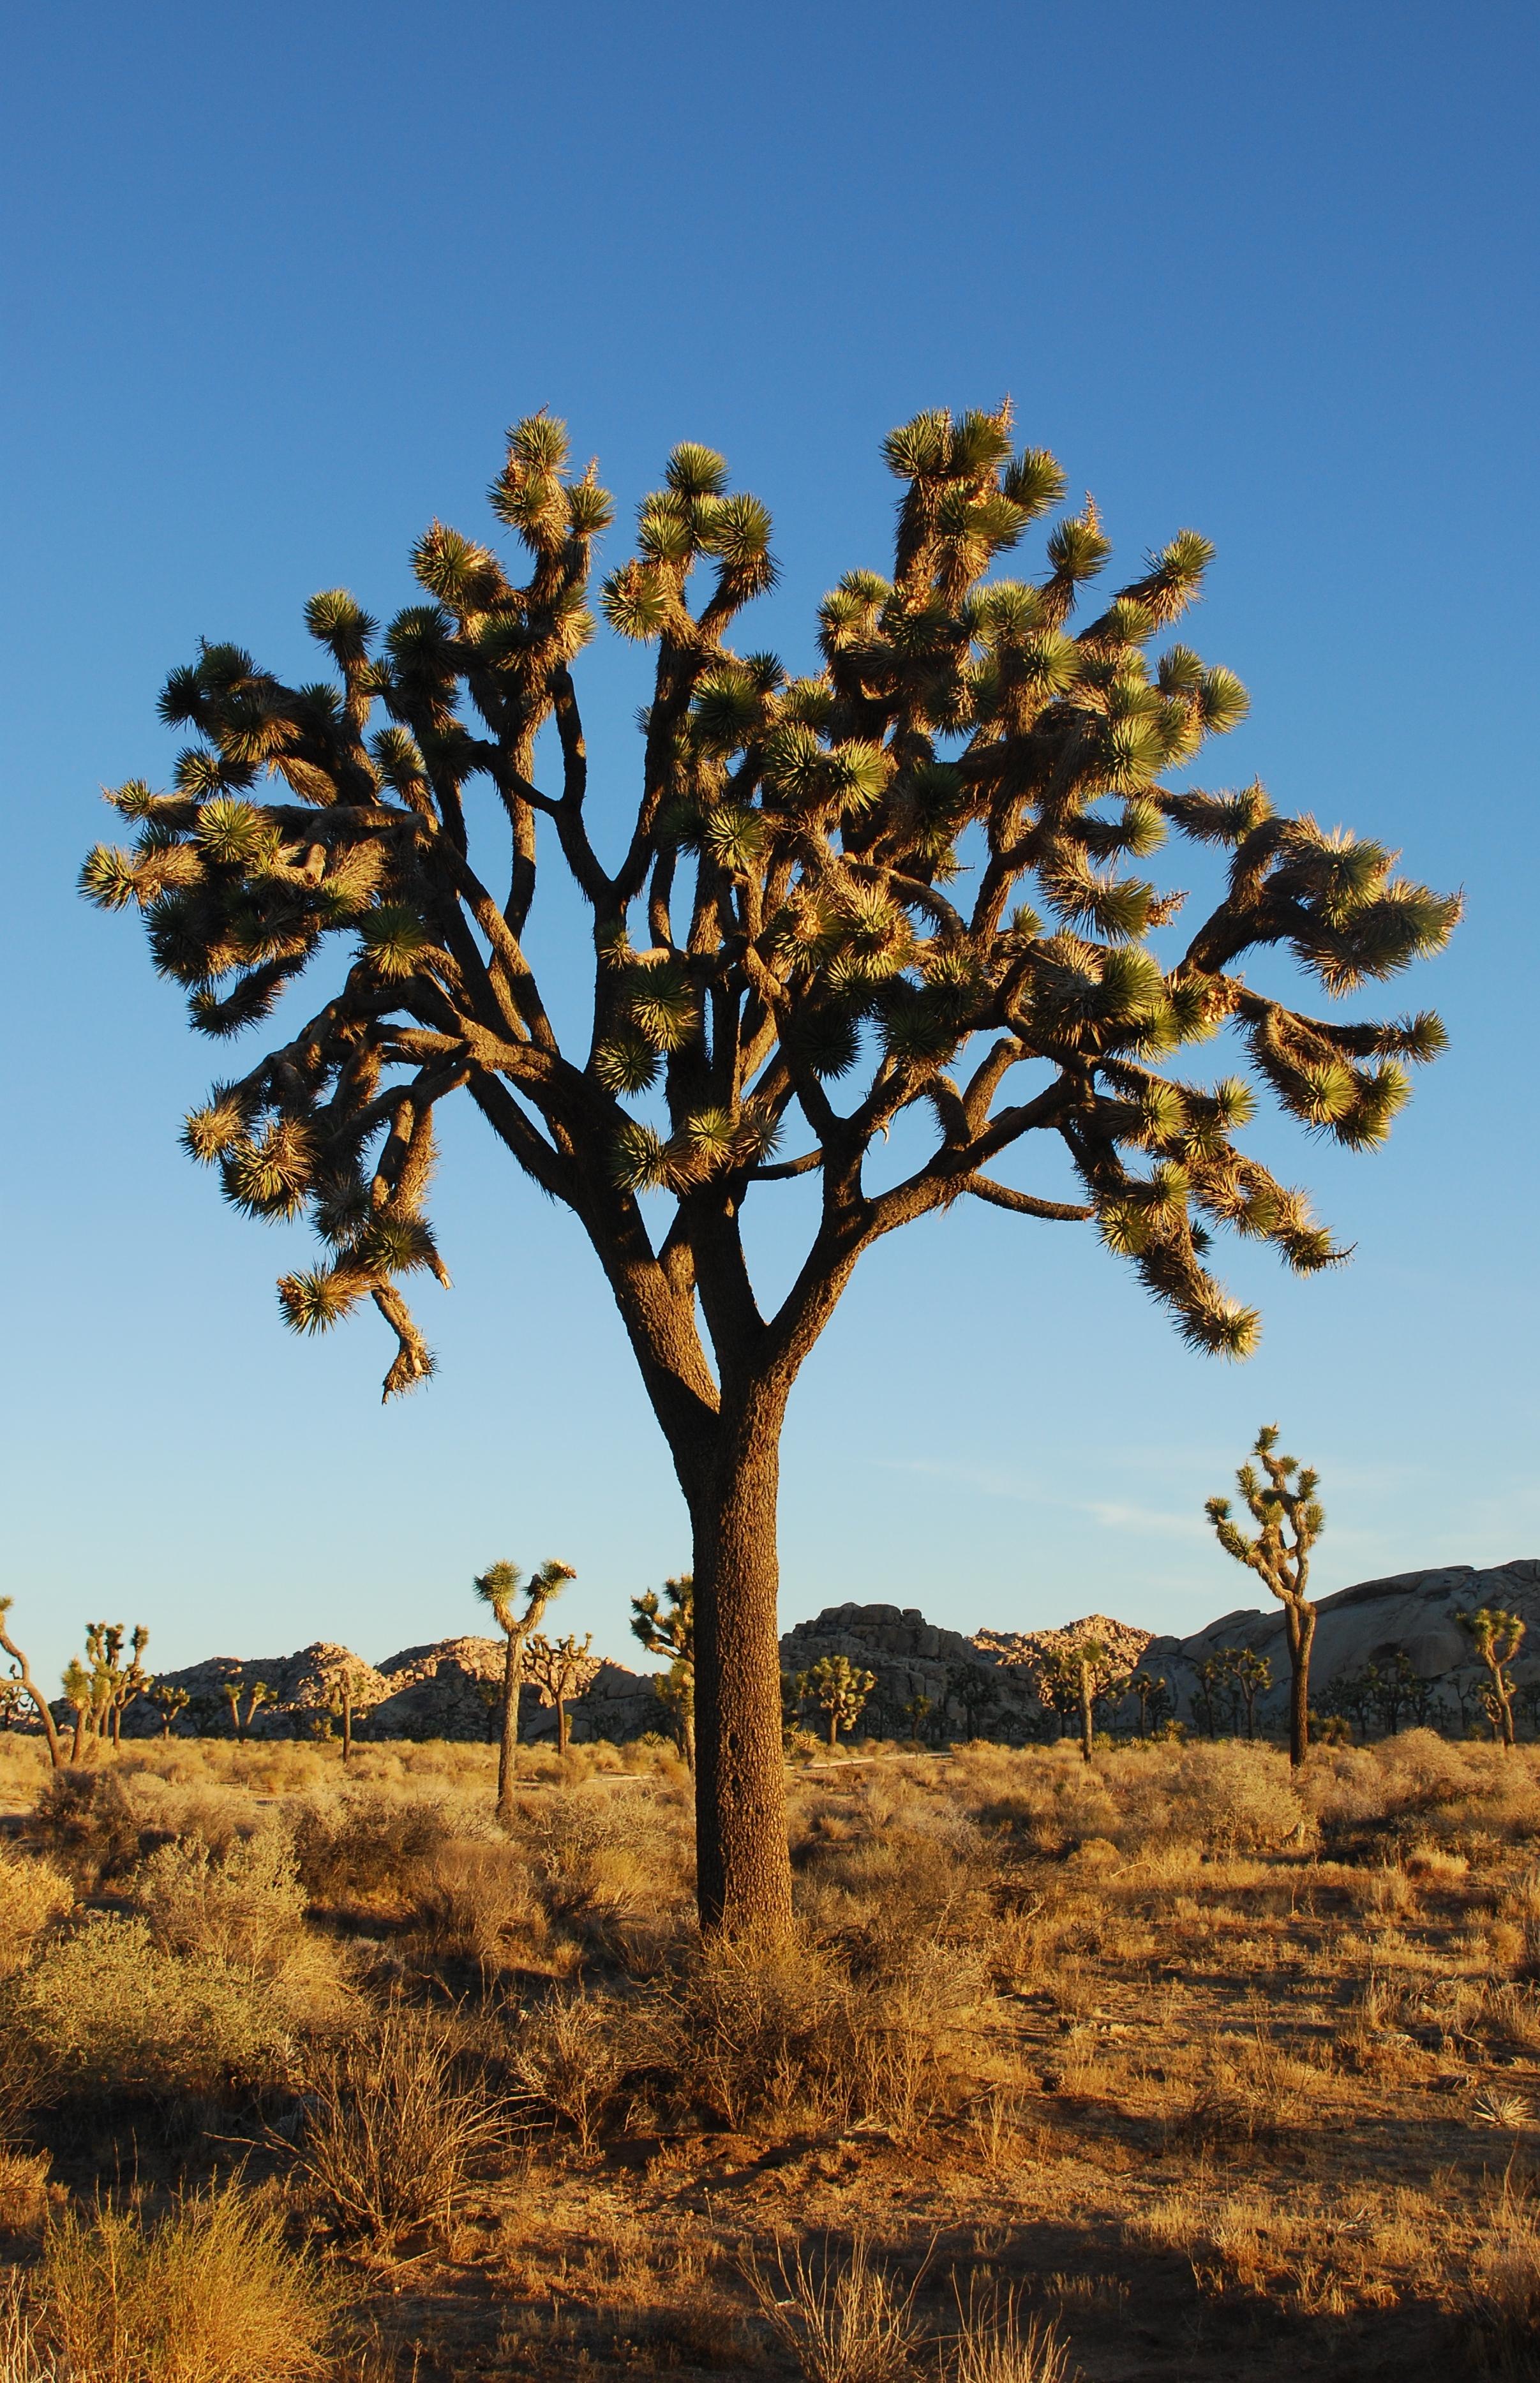 Foto: Bernard Gagnon. Taget i Joshua Tree National Park, Kalifornien. CC BY-SA 3.0